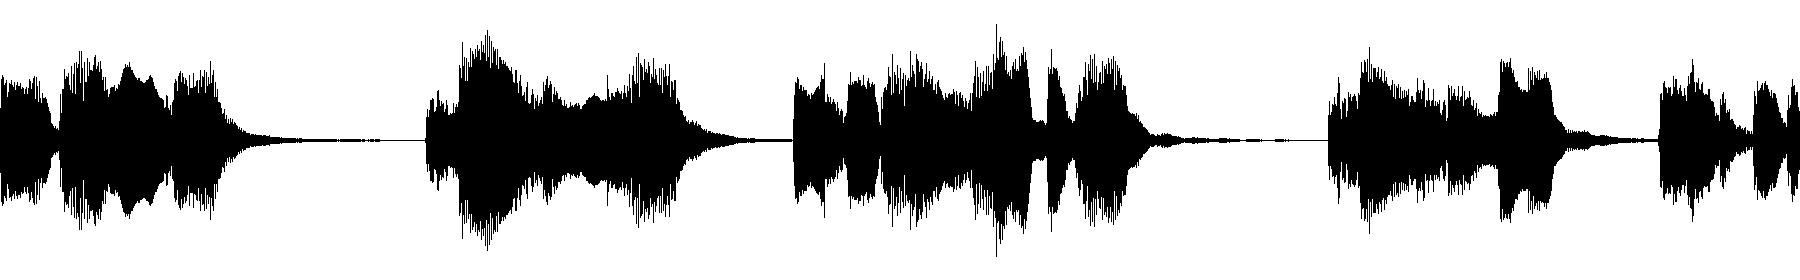 95 c ep stillsonice 01